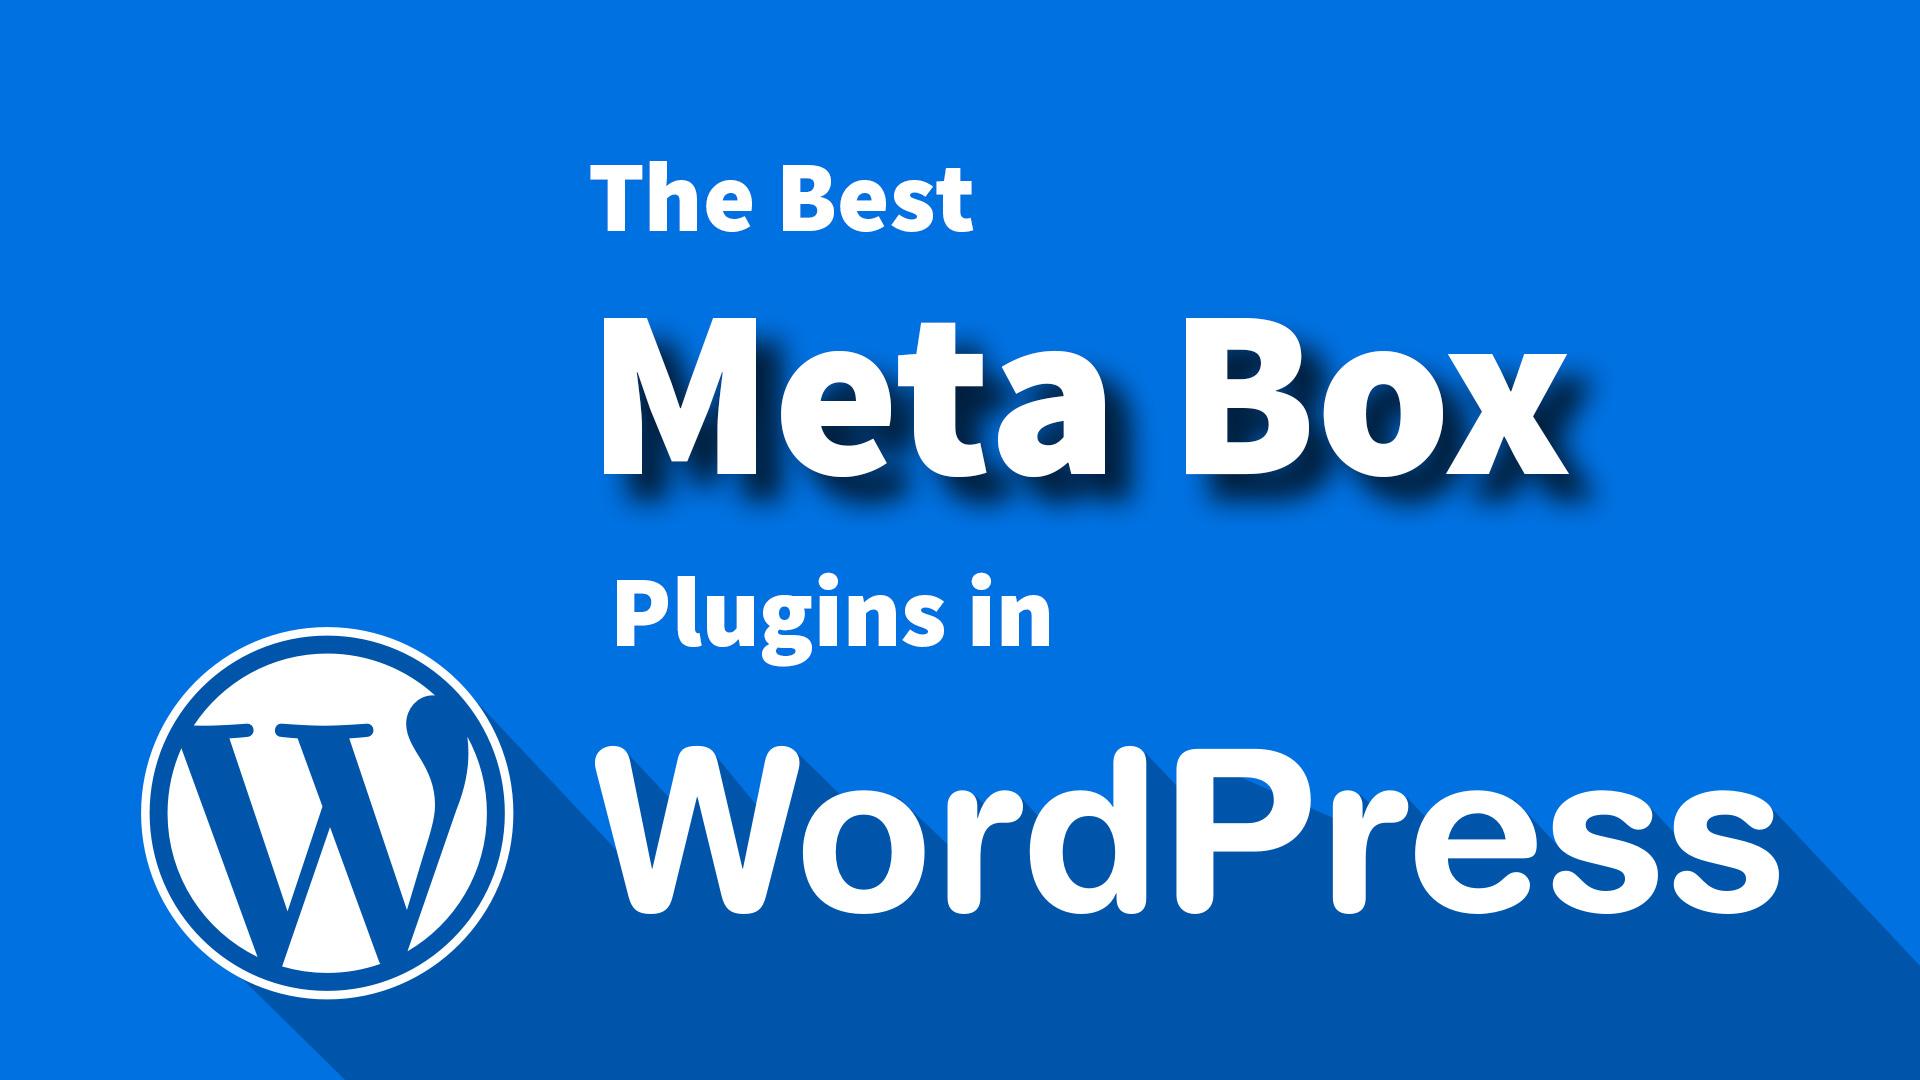 The best Meta Box plugins in WordPress